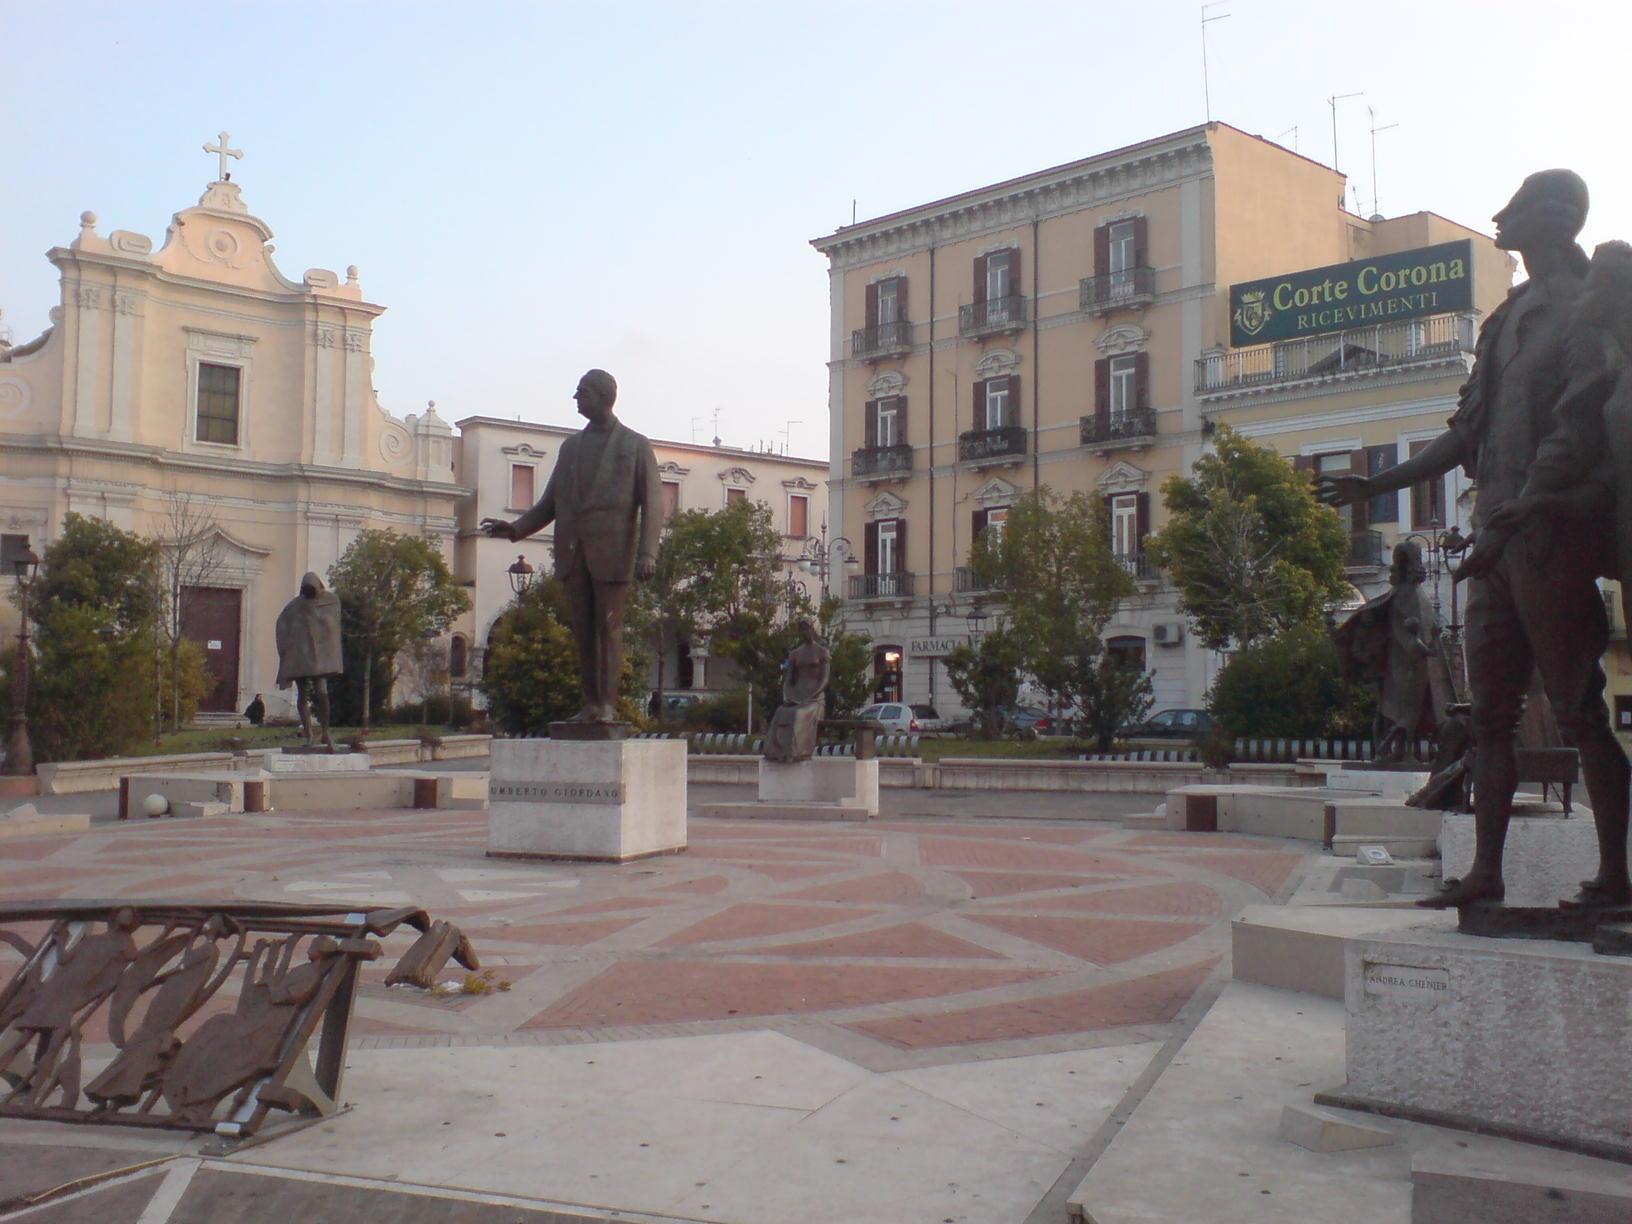 Foggia, Piazza Umberto Giordano